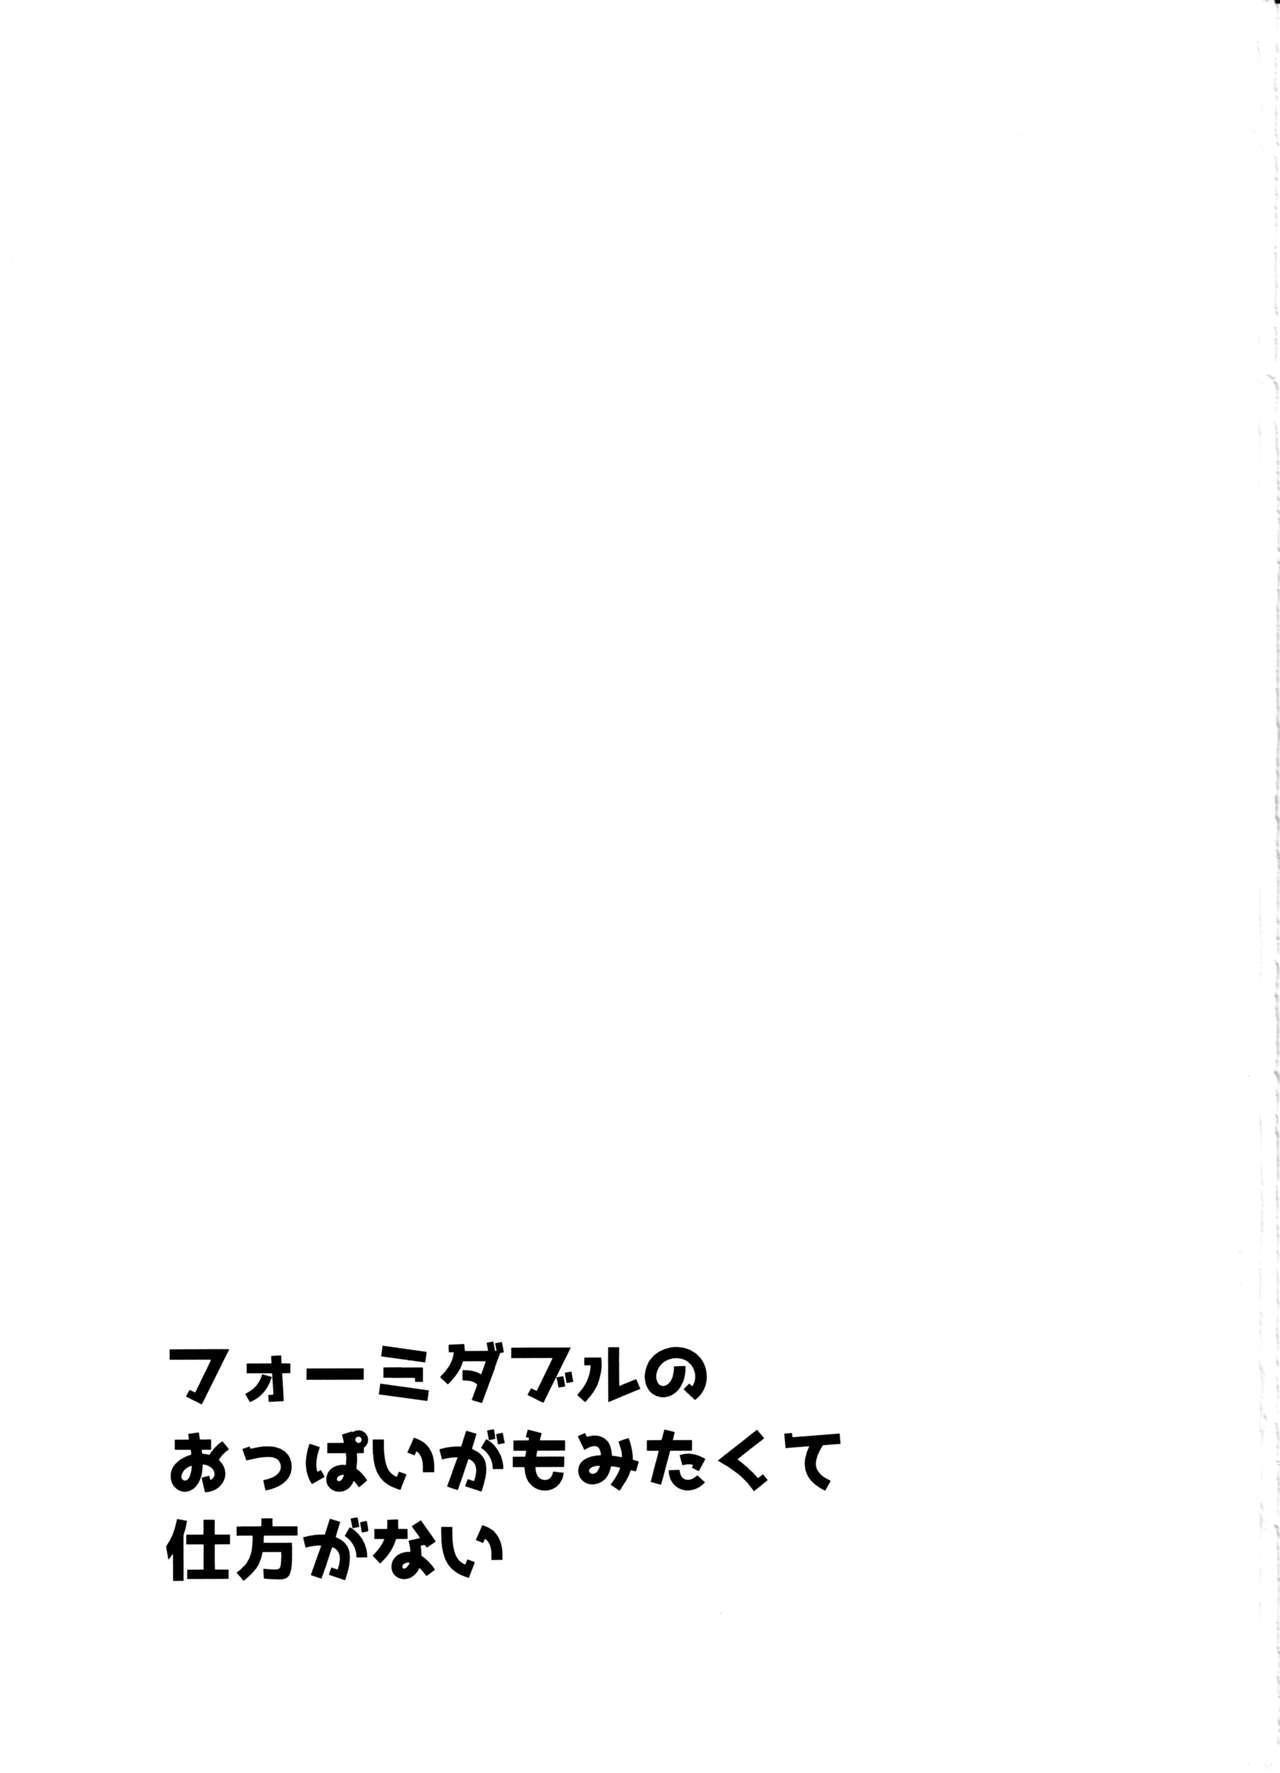 Formidable no Oppai ga Momitakute Shikataganai 1